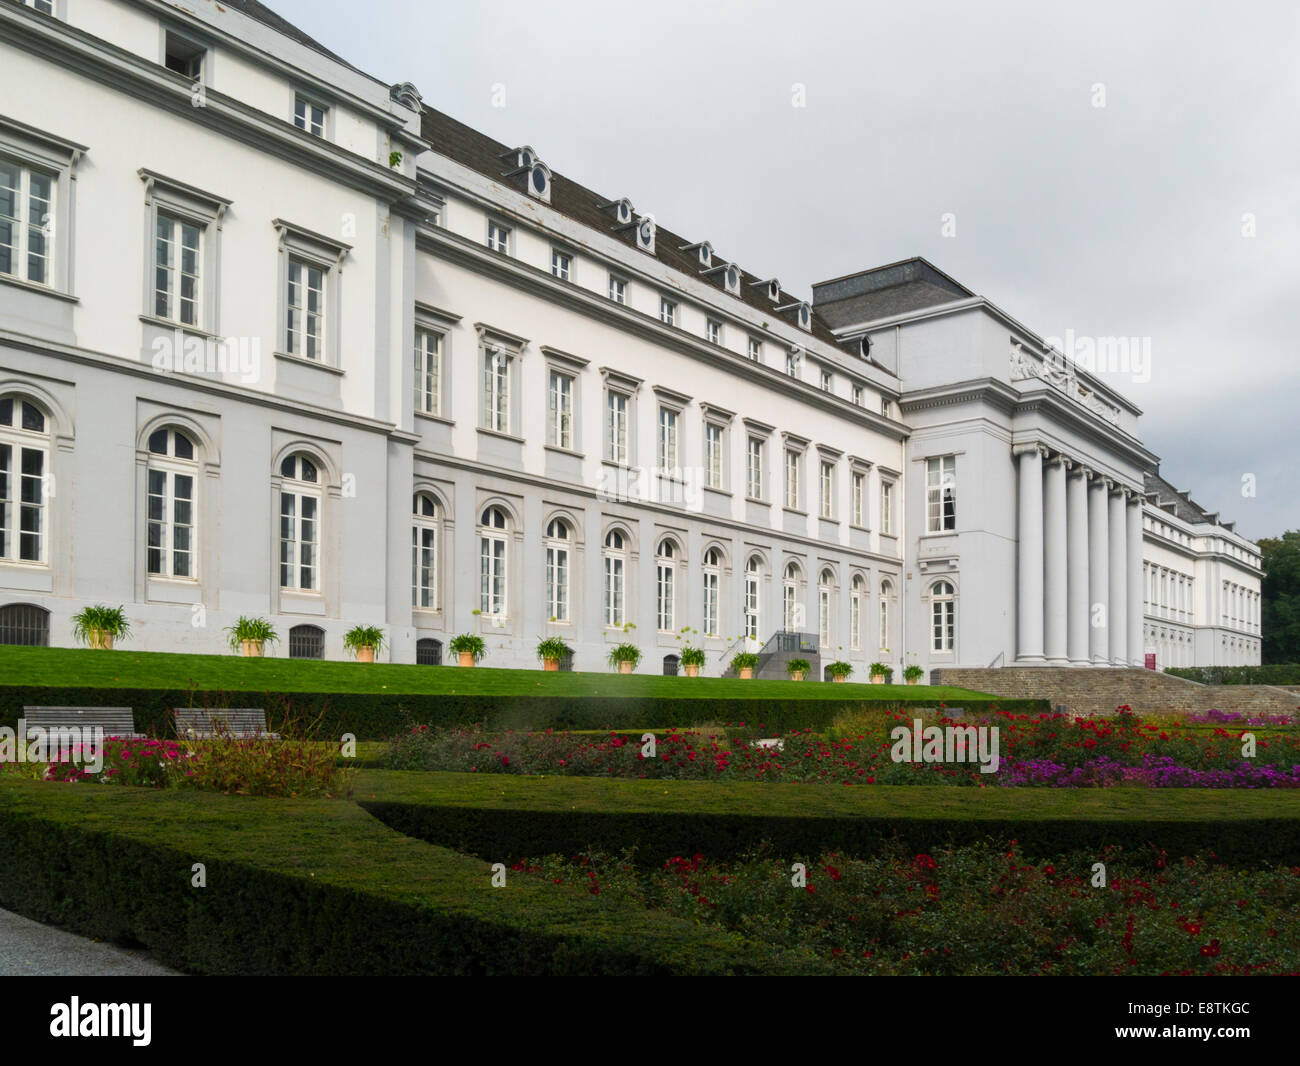 Kurfurstfiches Schloss- Electoral Palace former home of Archbishop of Trier Koblenz Germany EU on lovely september - Stock Image